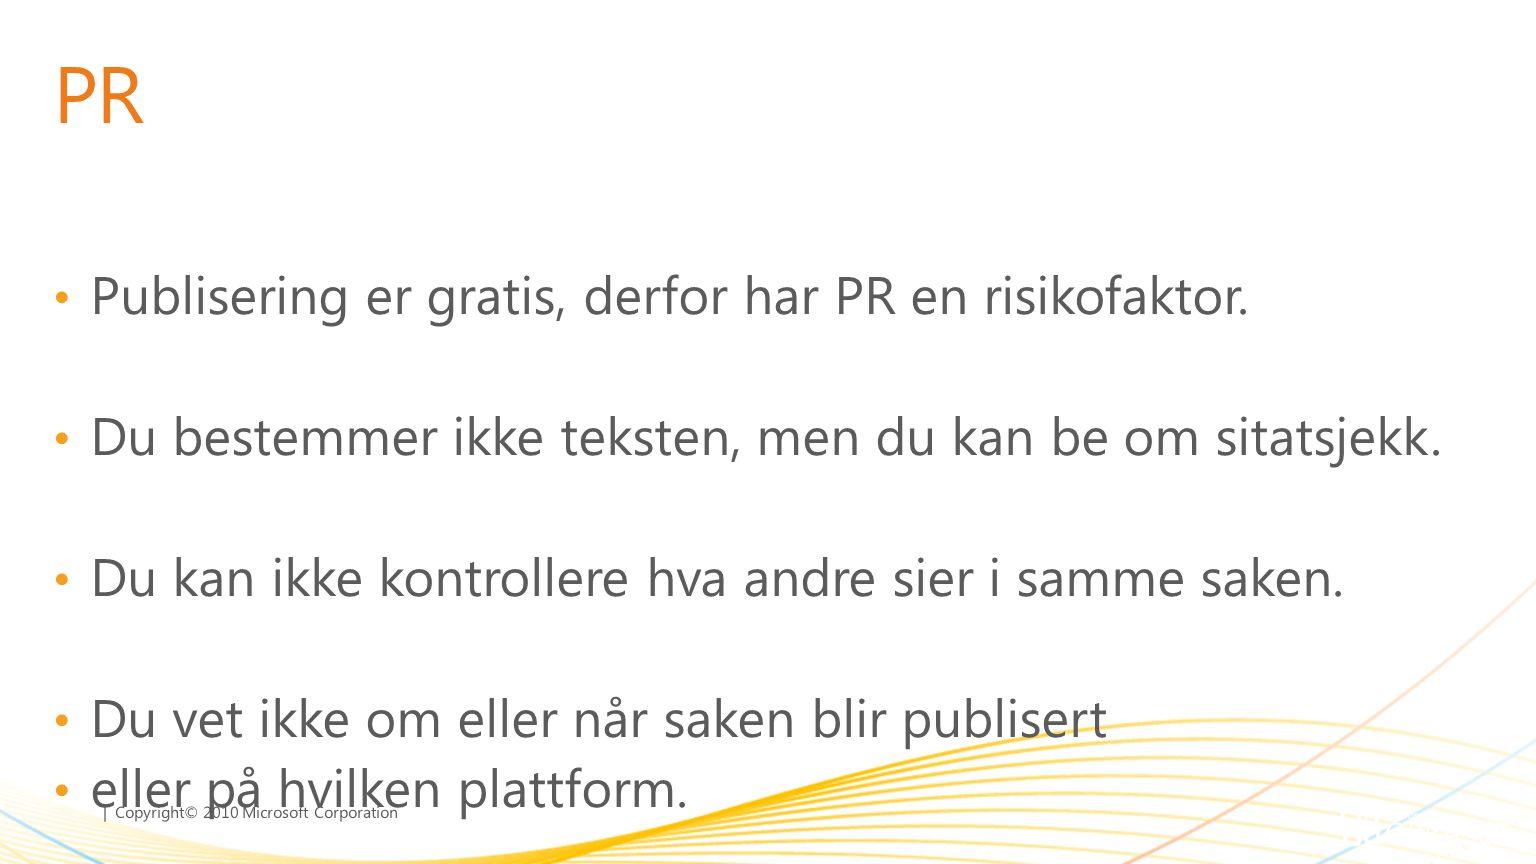 PR Publisering er gratis, derfor har PR en risikofaktor.